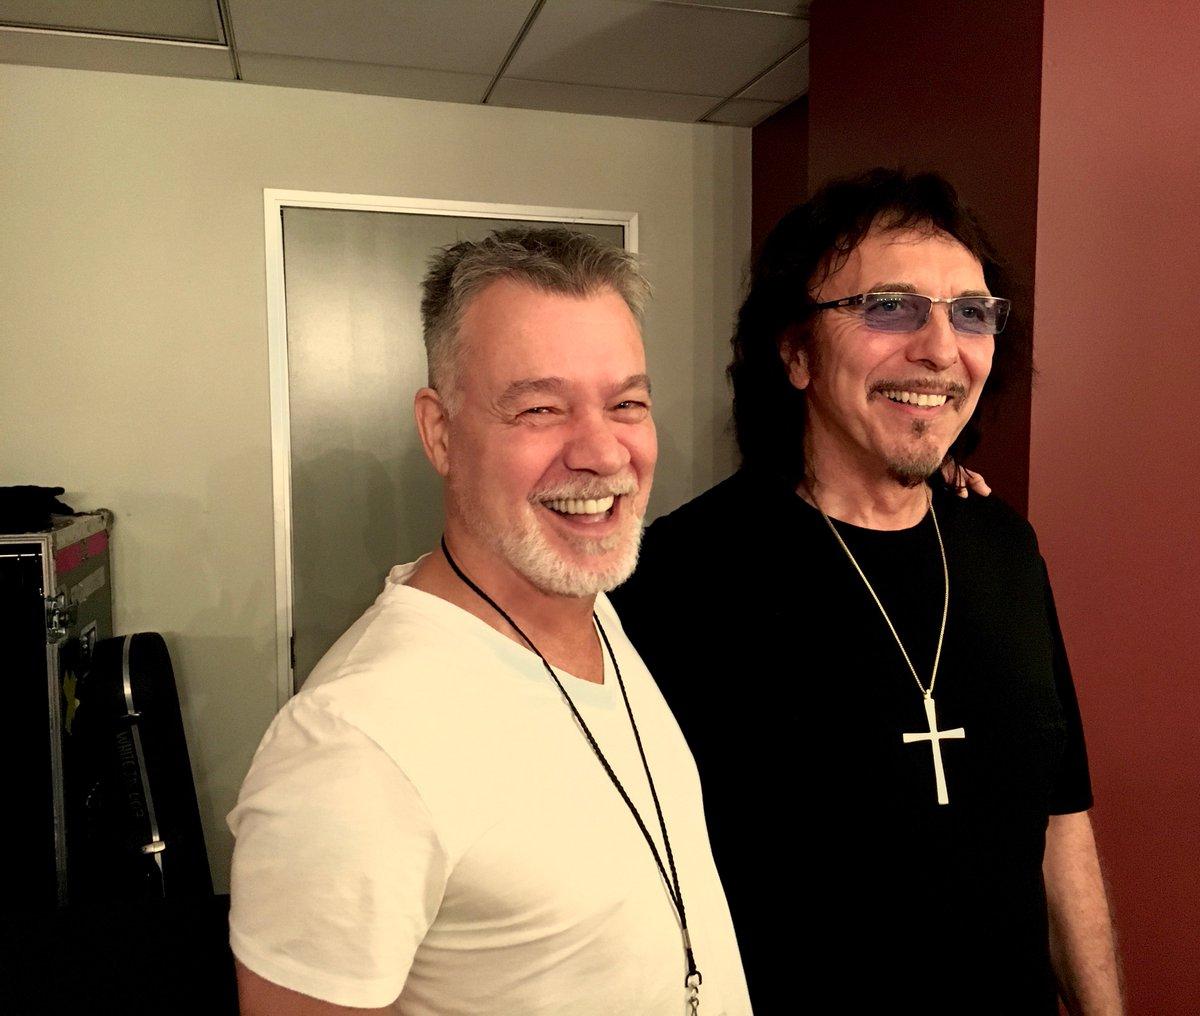 Last night, Black Sabbath at the Hollywood Bowl https://t.co/6QIOyQnFrH